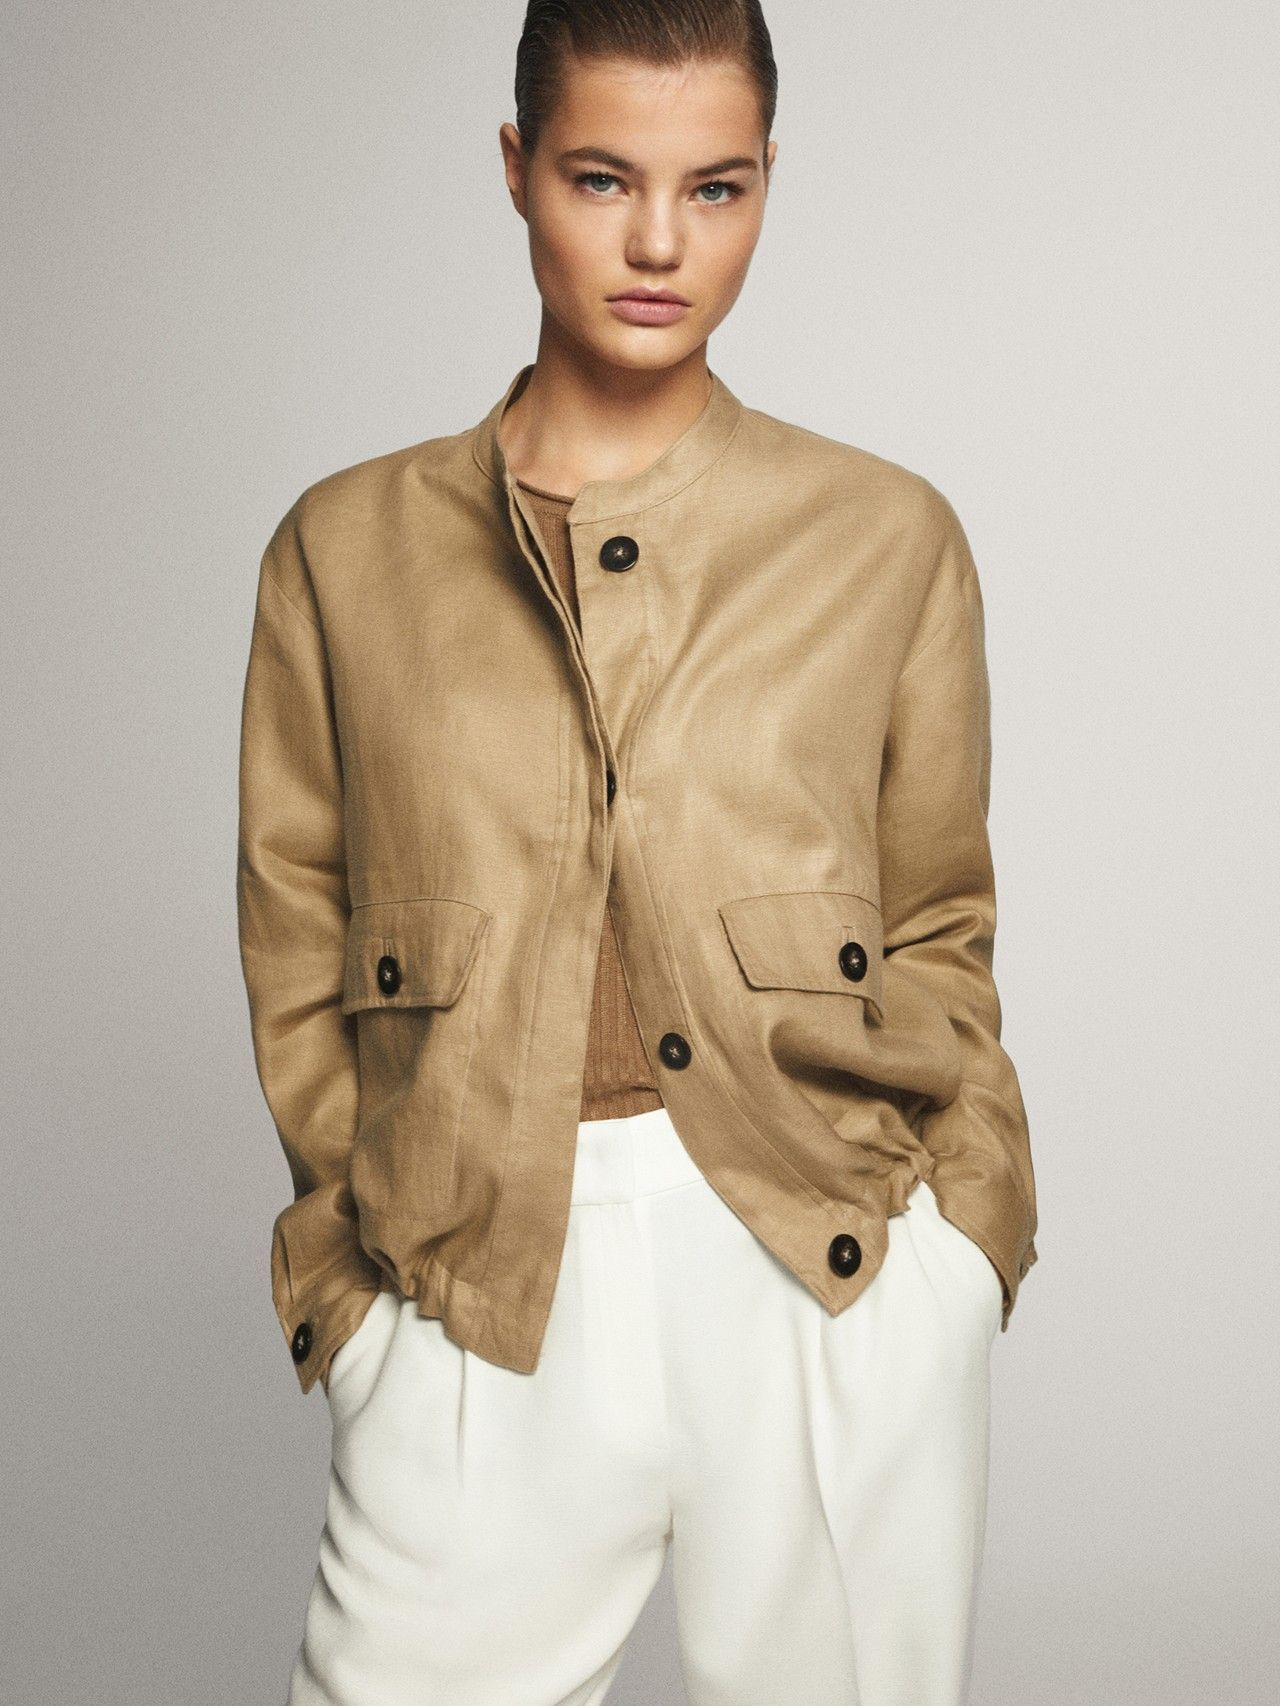 Massimo Dutti Mujer Chaqueta Corta Lino Beige Xs Linen Jackets Women Bomber Jacket Women Linen Jackets